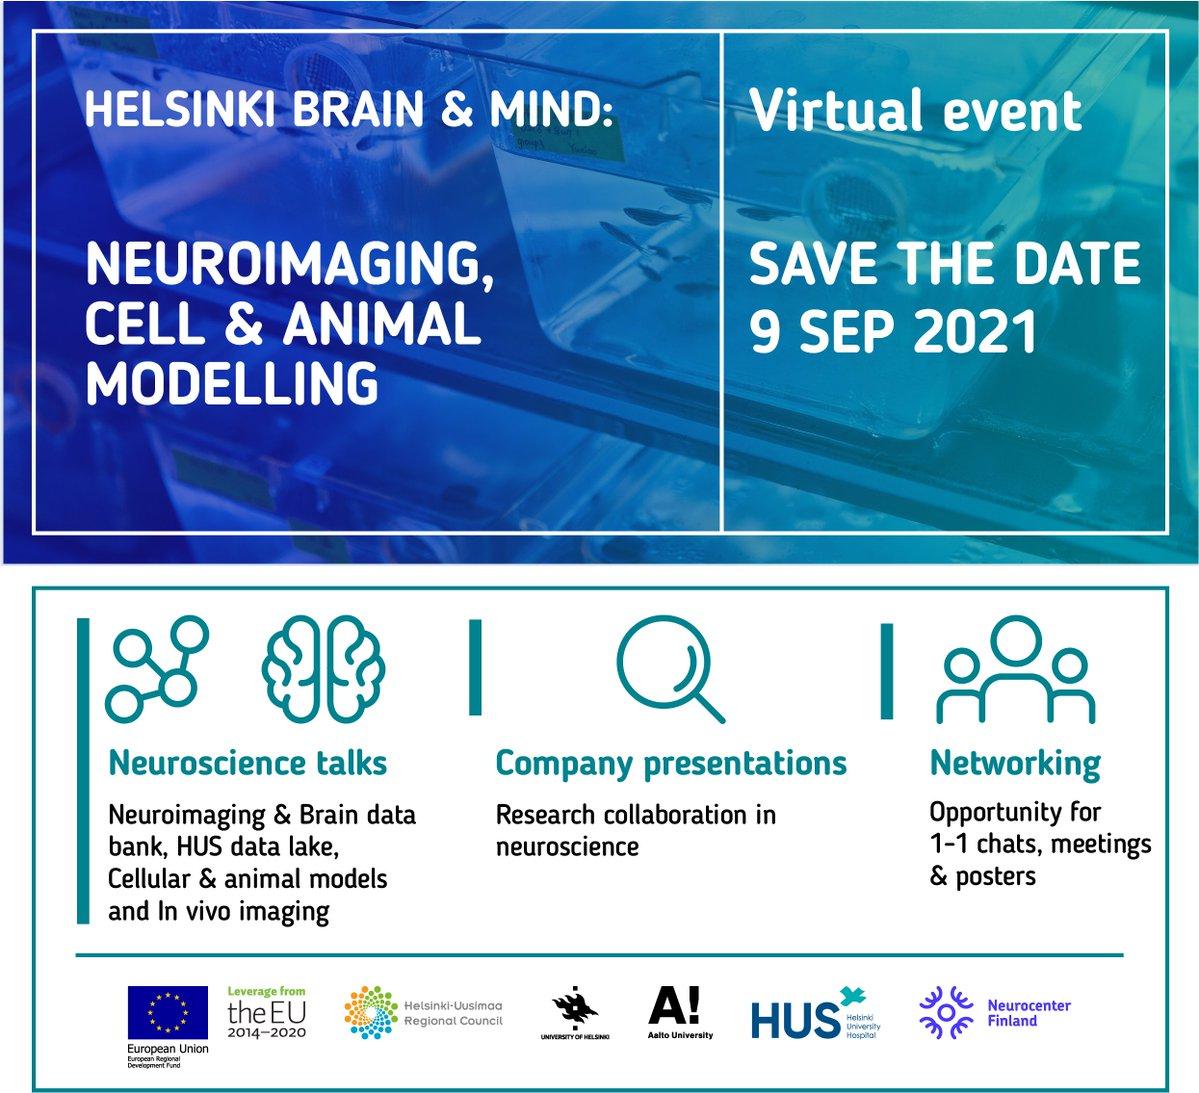 Helsinki Brain & Mind collaboration event banner